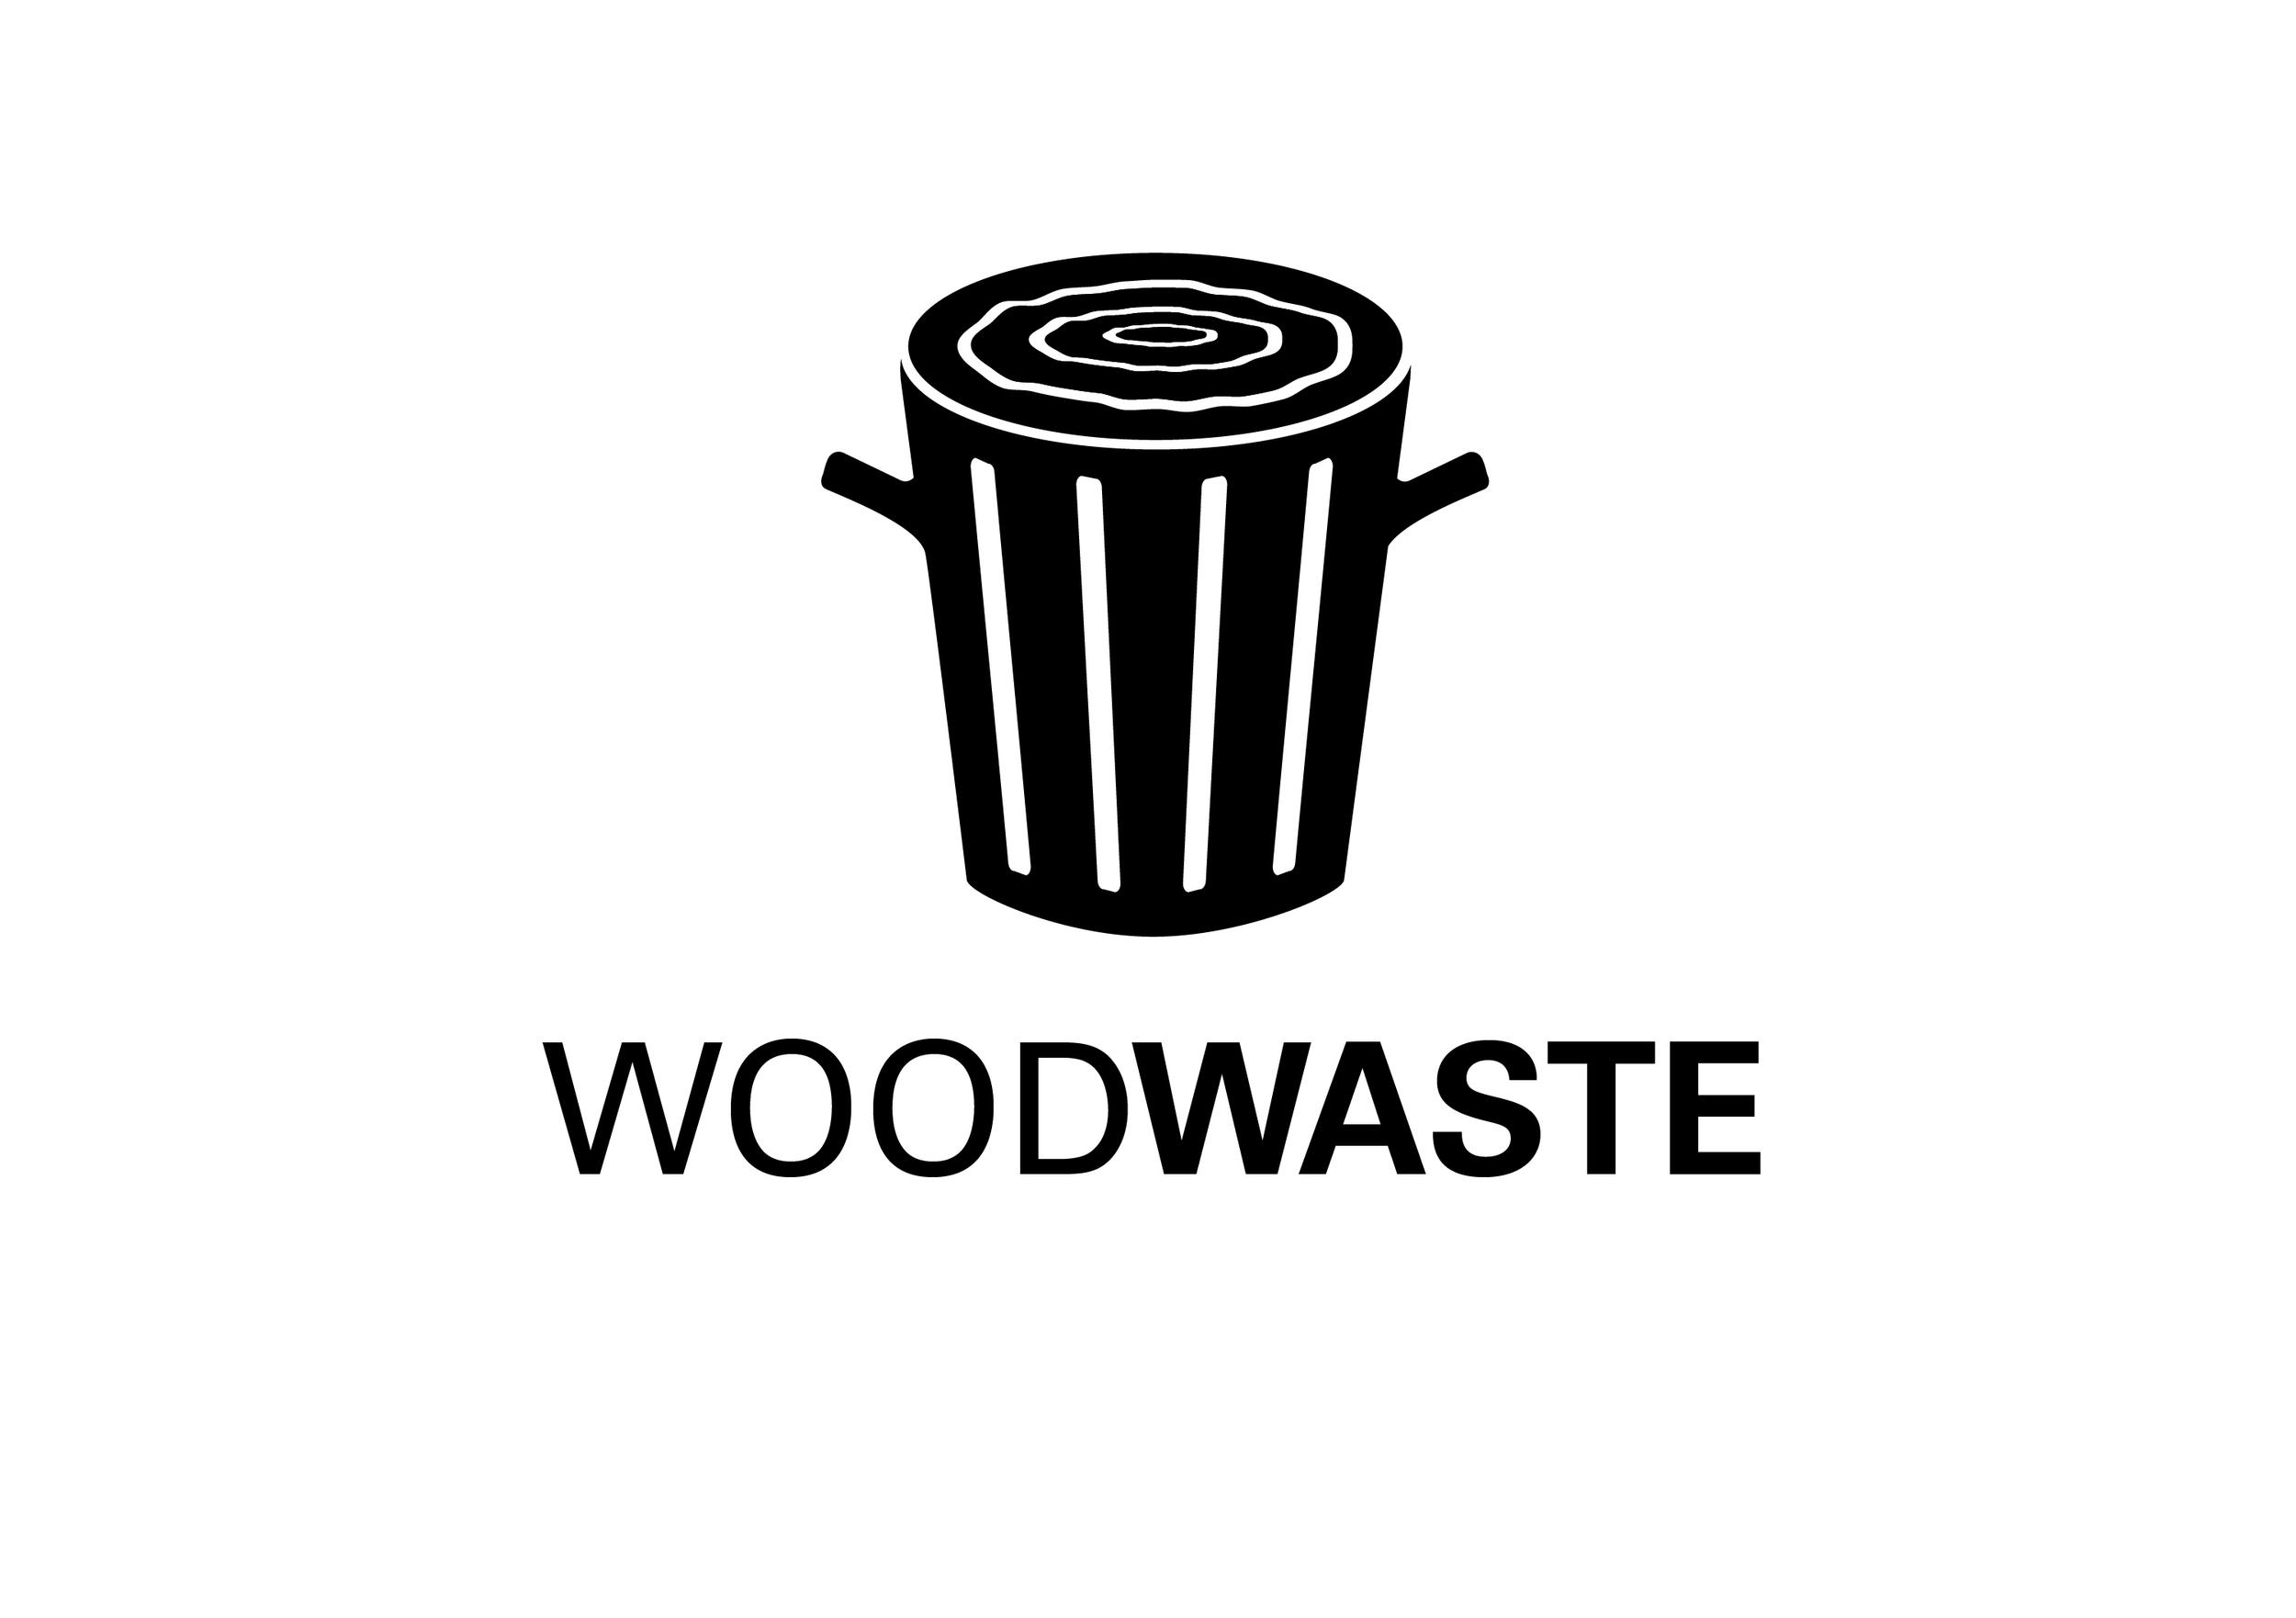 woodwaste-01.jpg